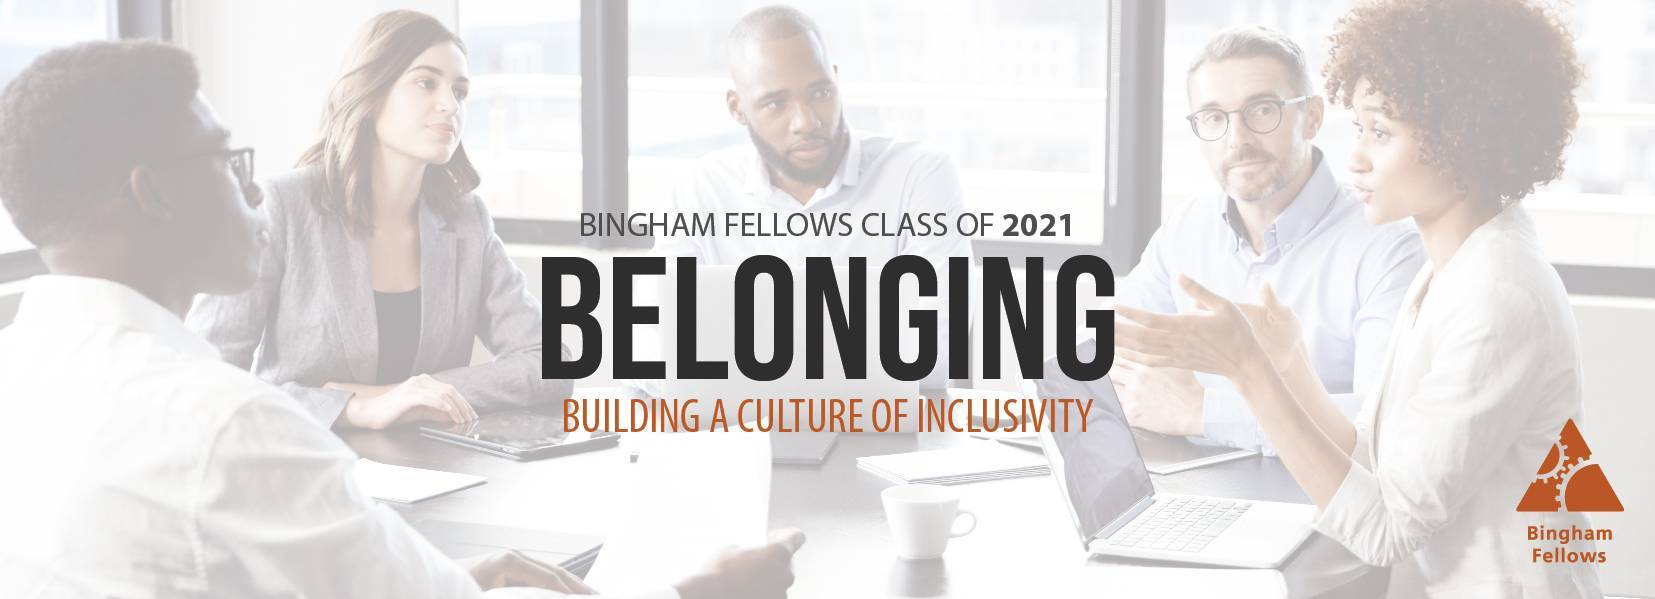 Bingham Fellows 2021